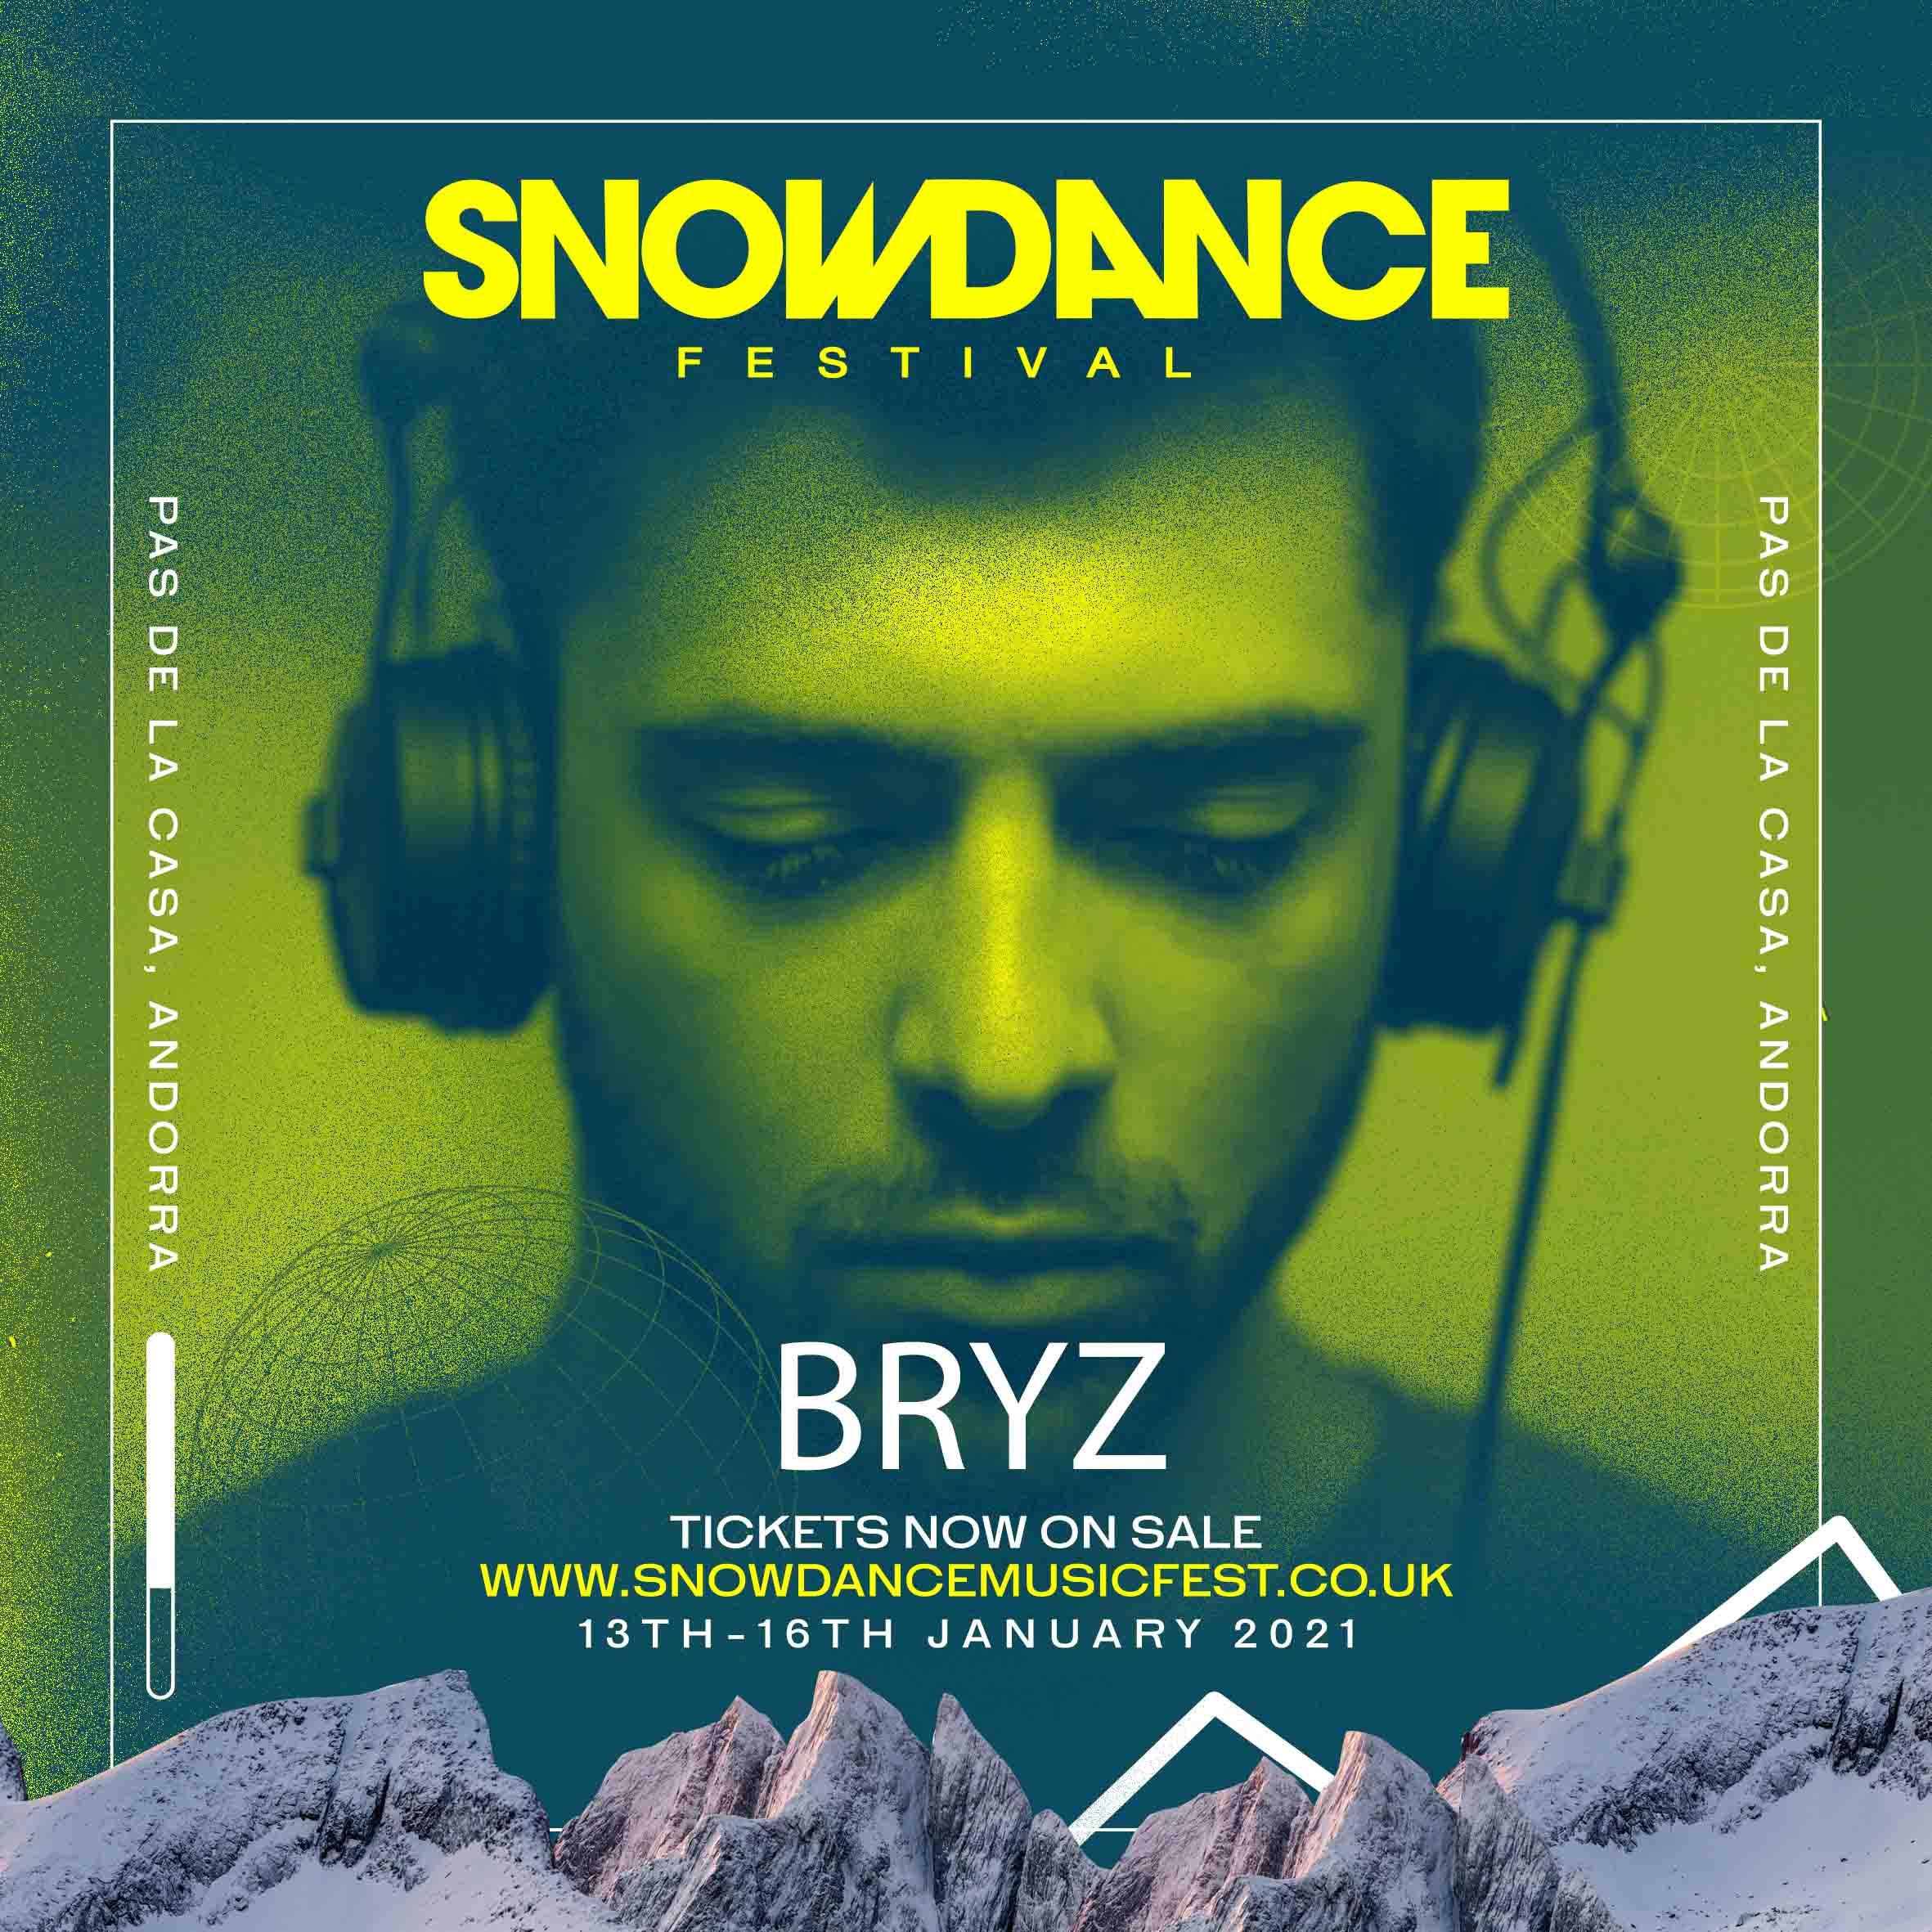 SnowDance festival bryz